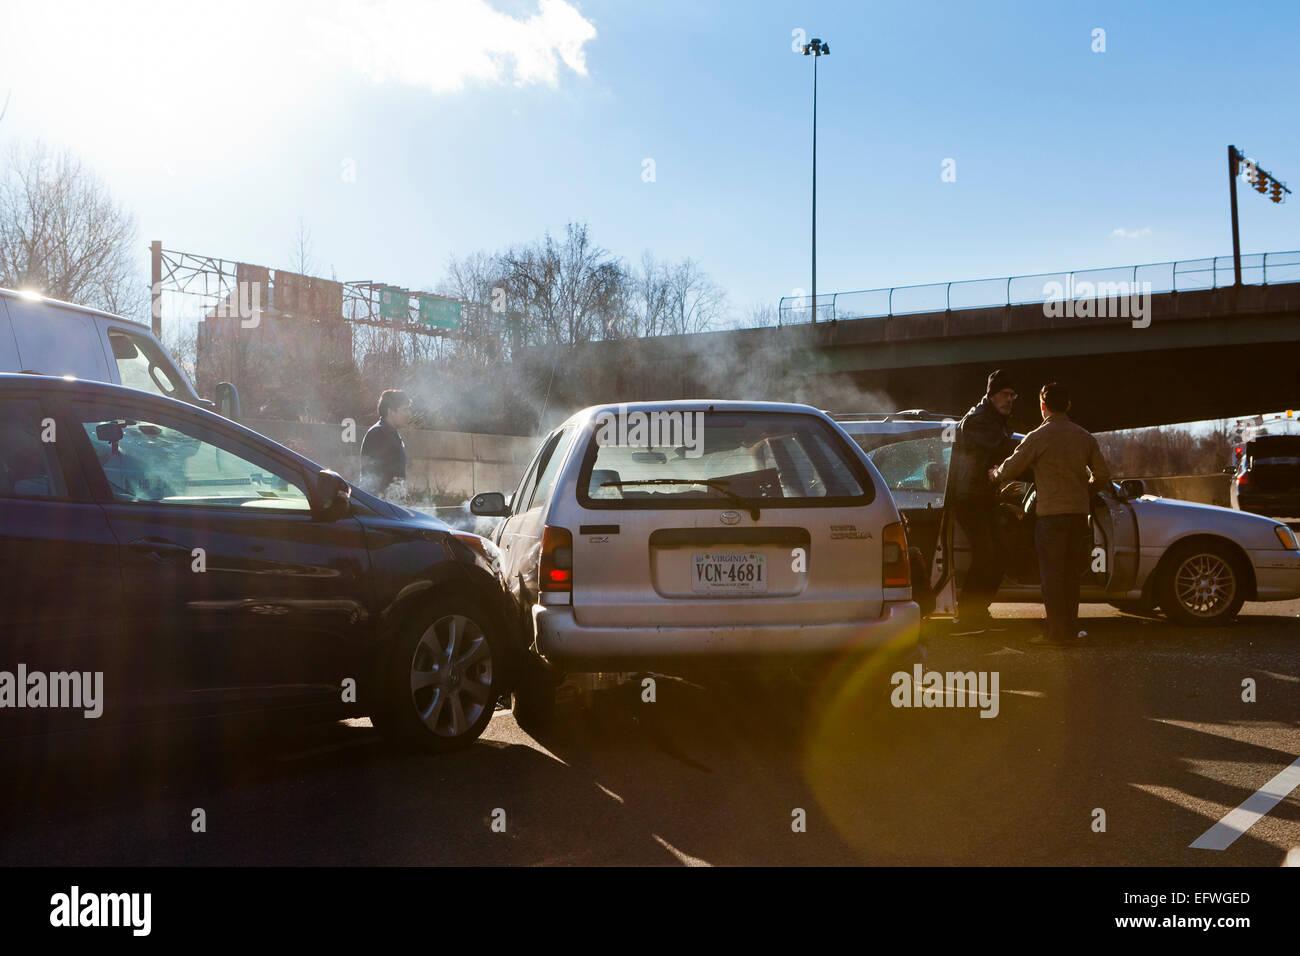 Multi vehicle auto  accident on road - USA - Stock Image